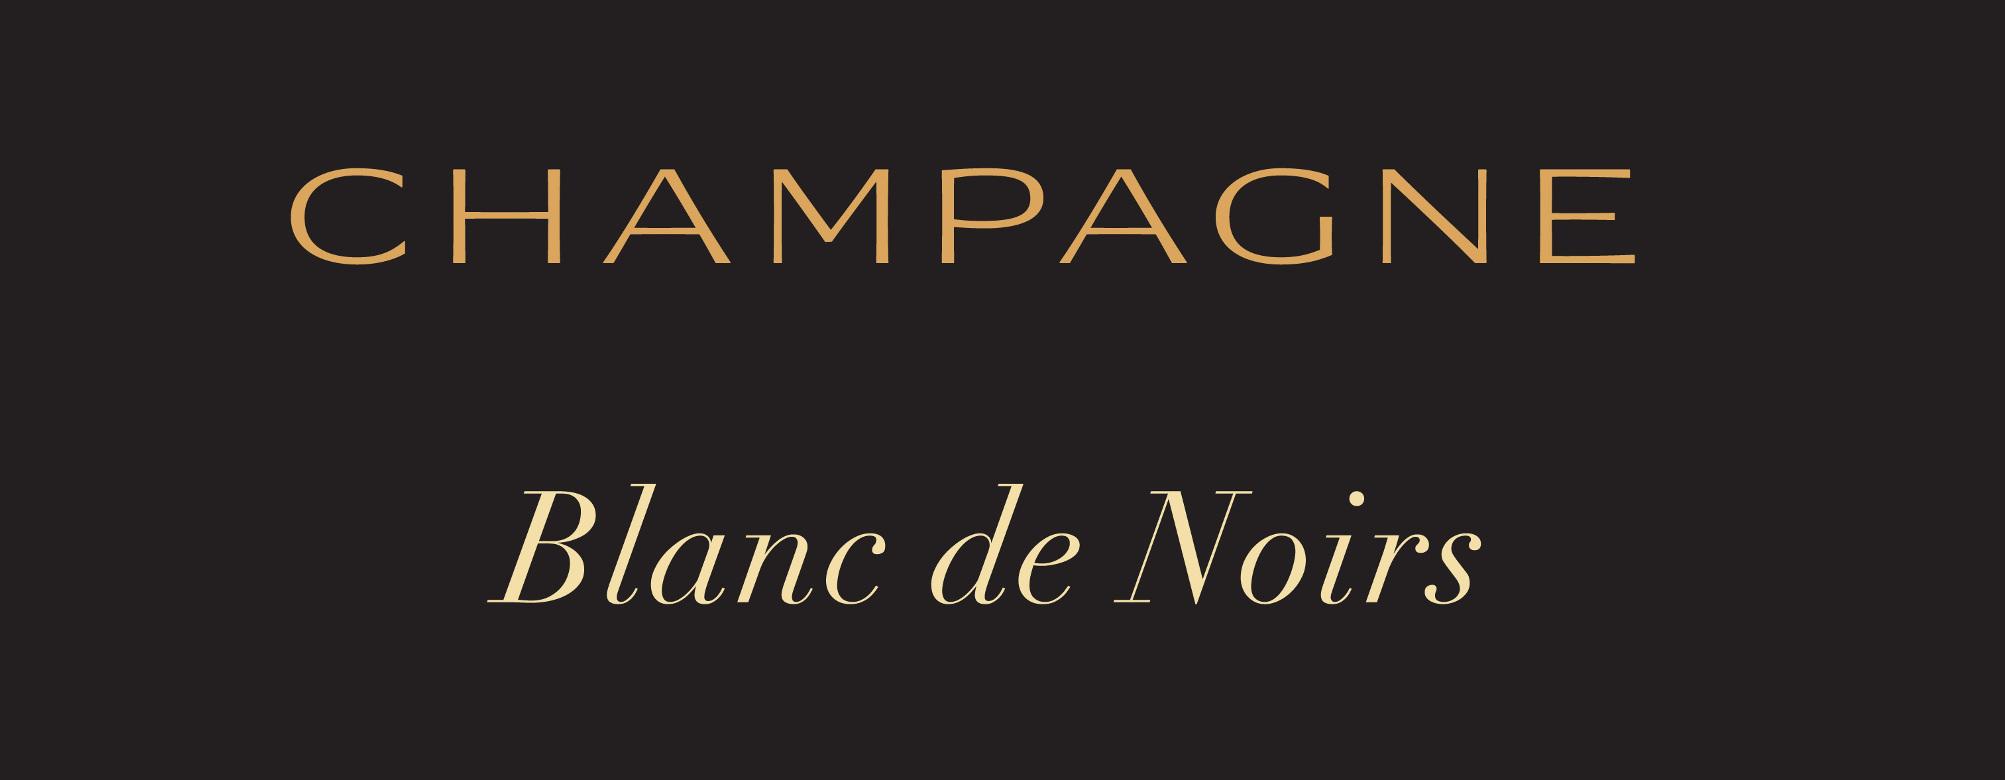 champagne-blanc-de-noirs-header